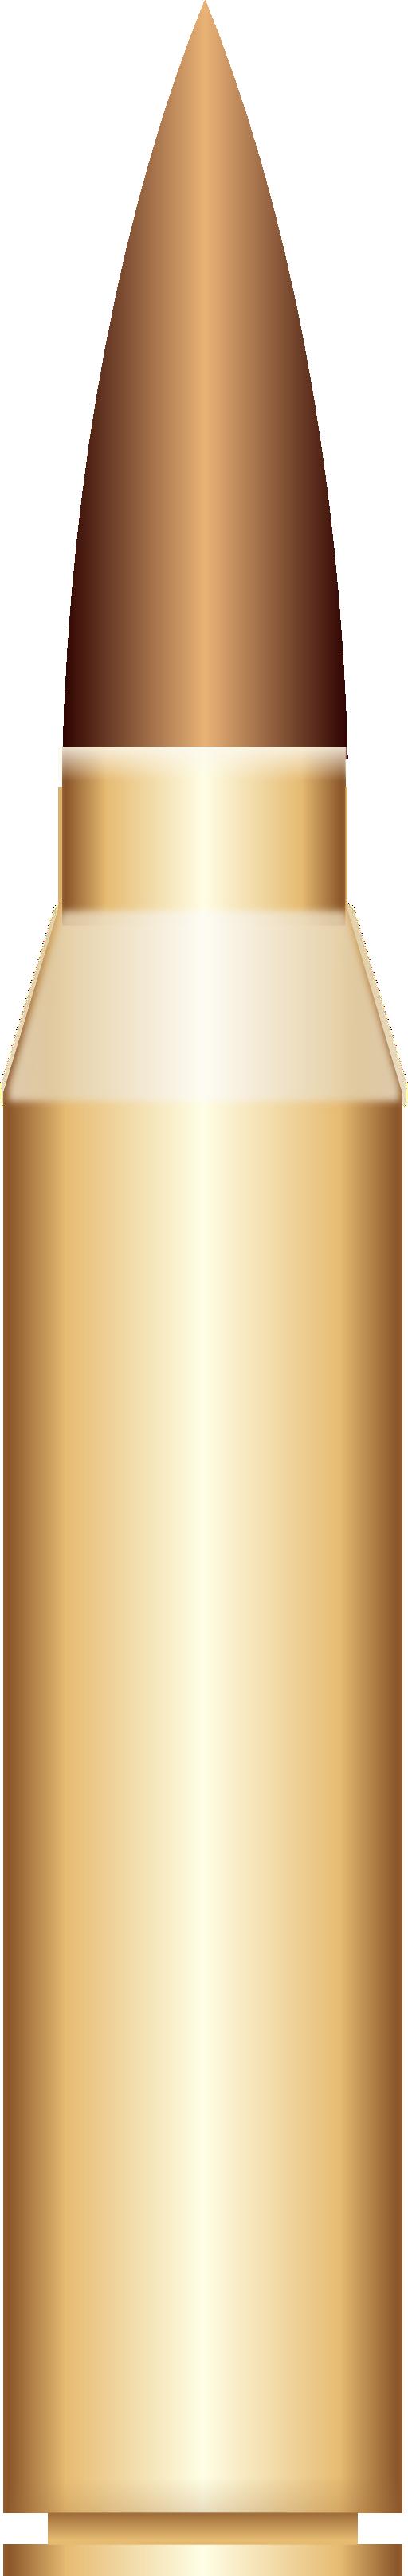 Bullet clipart html Free Free Bullet Art